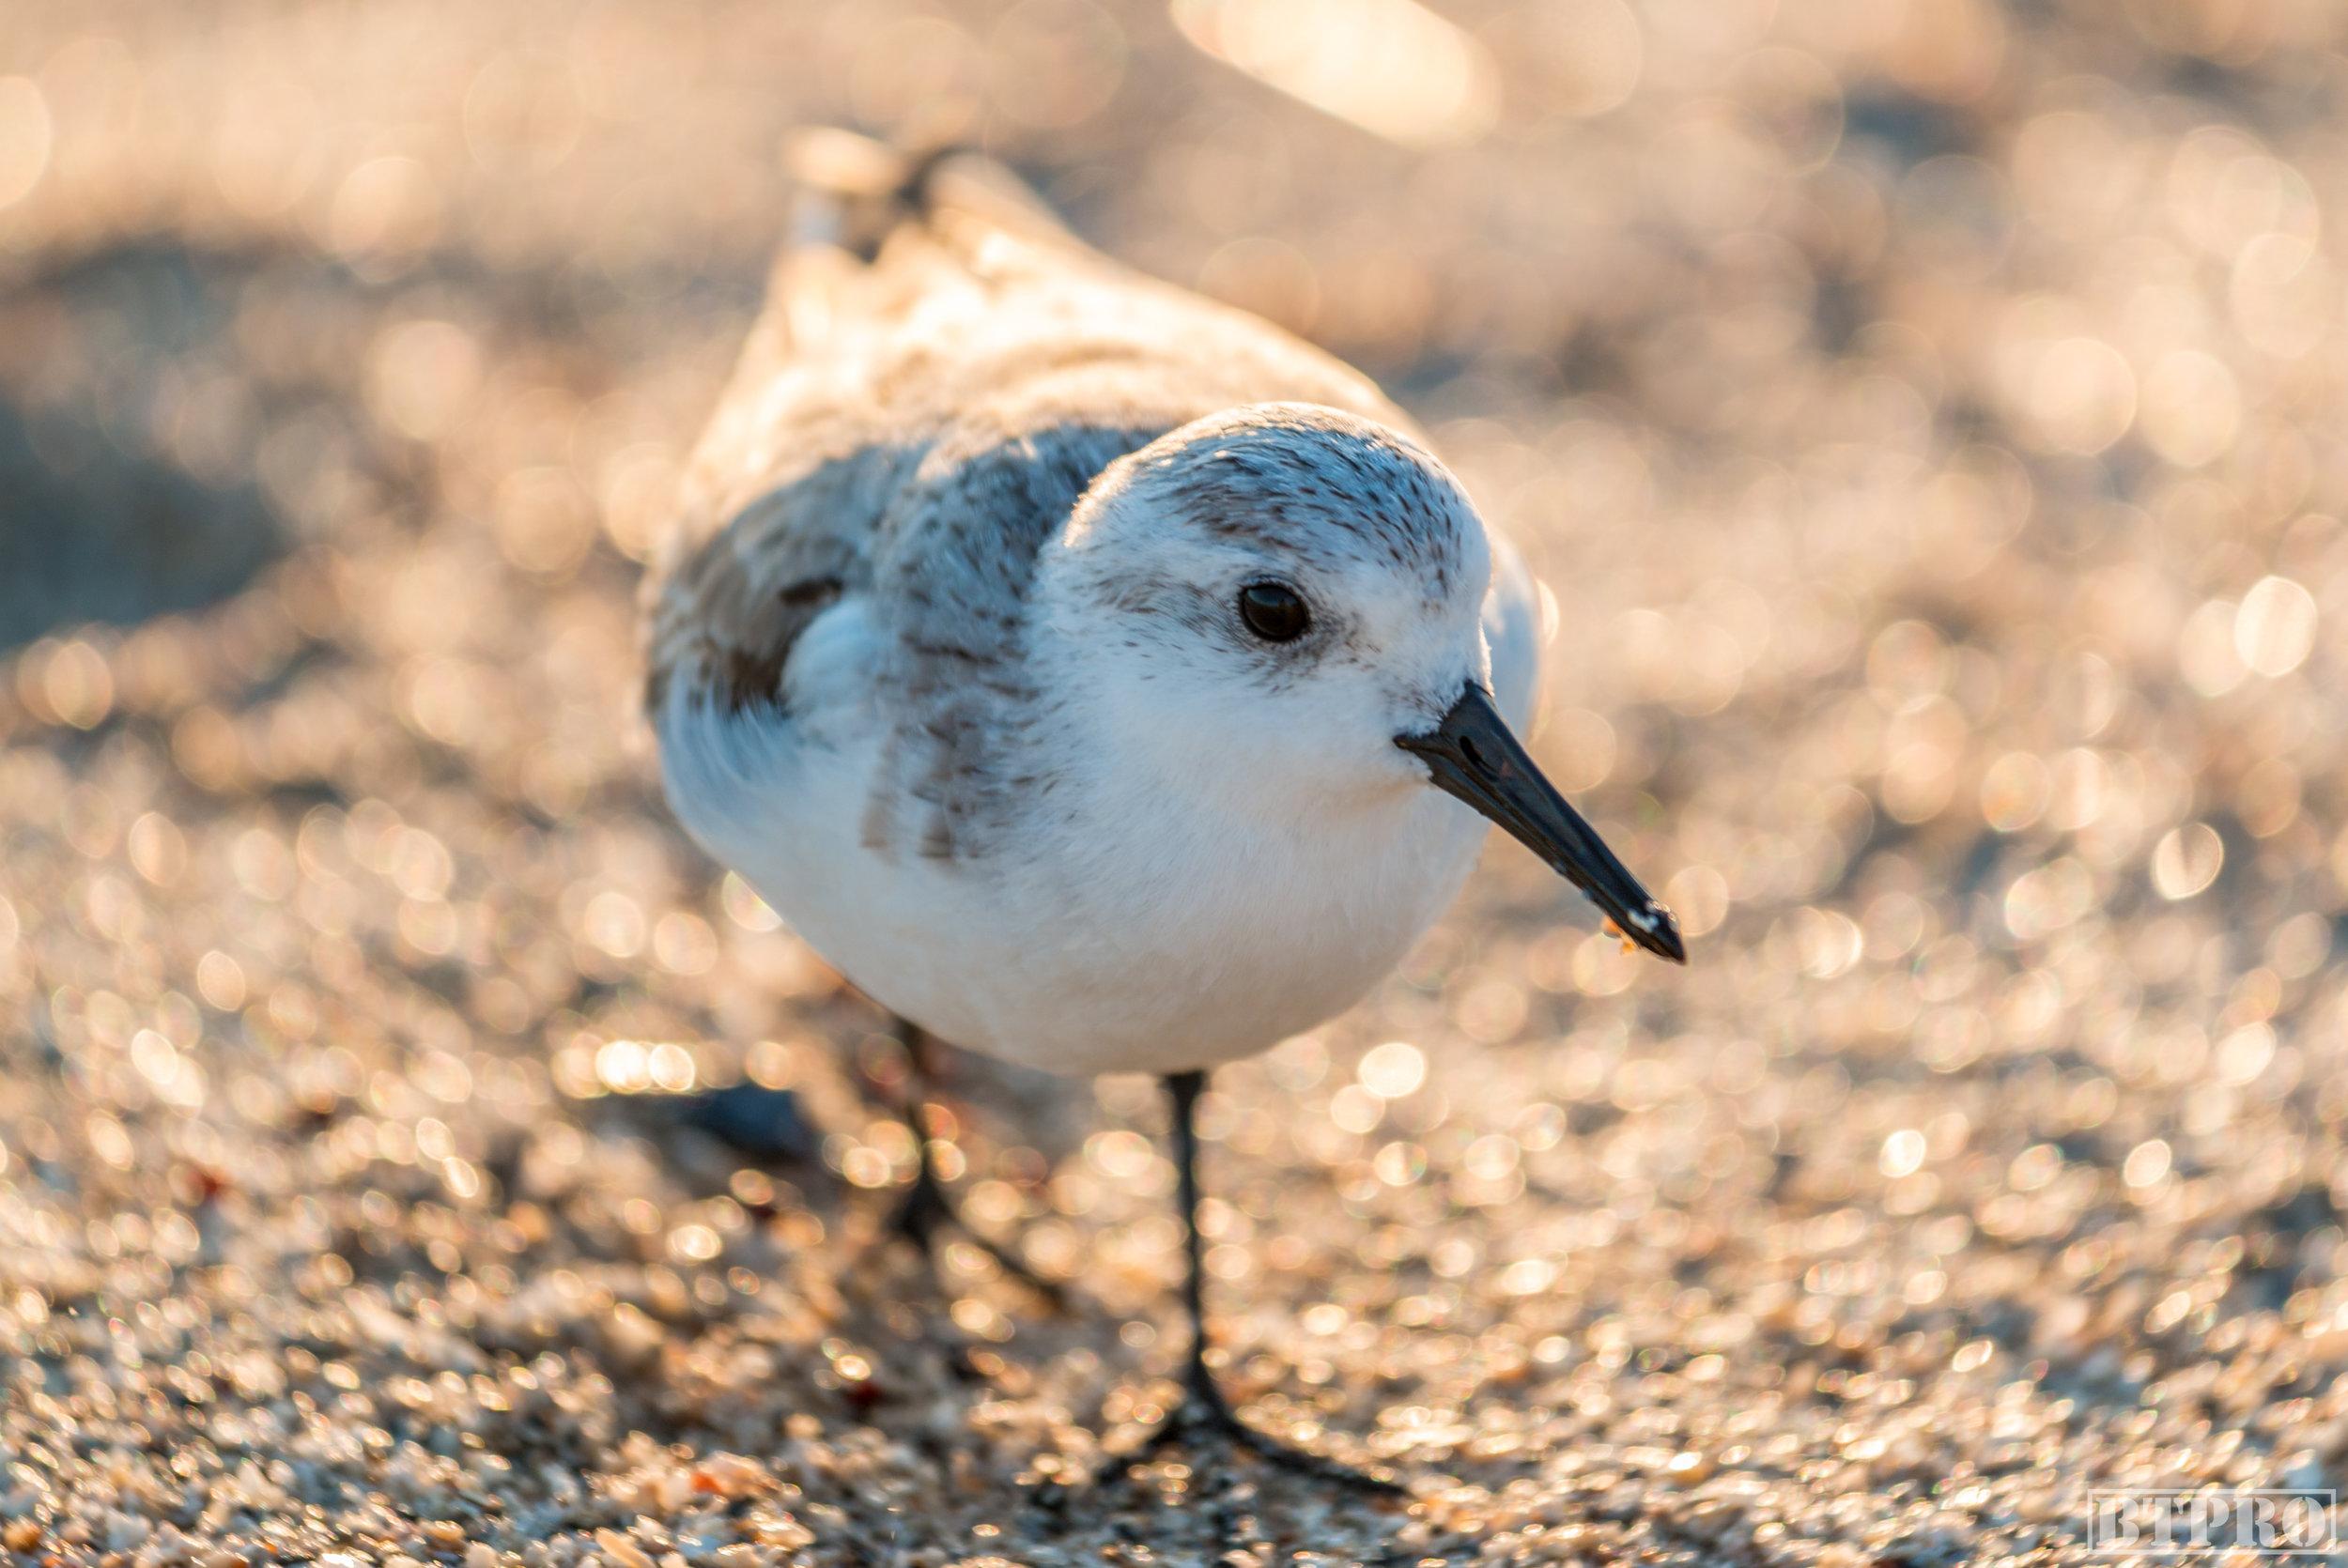 nature, nature photography, wildlife, wildlife photography, birds, bird photography, miami, miami wildlife